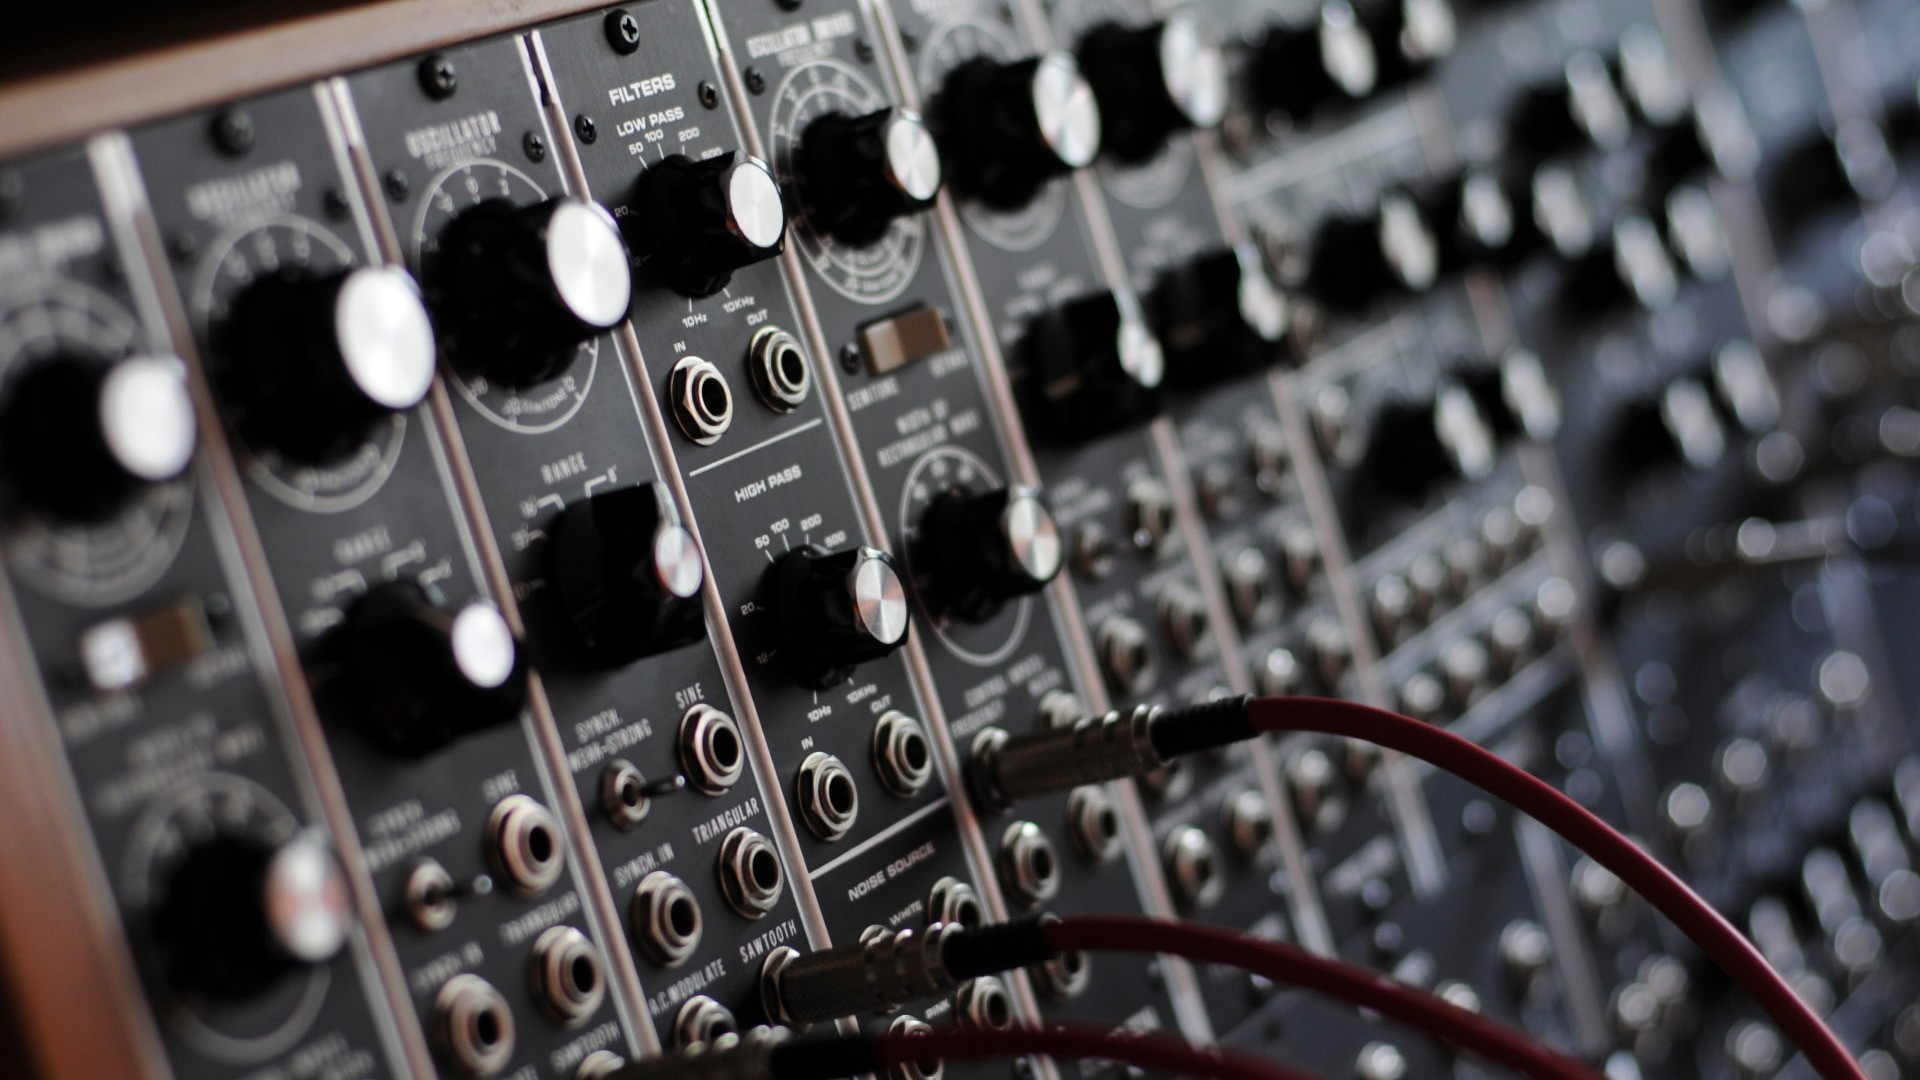 Moog modular wallpaper - LmK Music Production